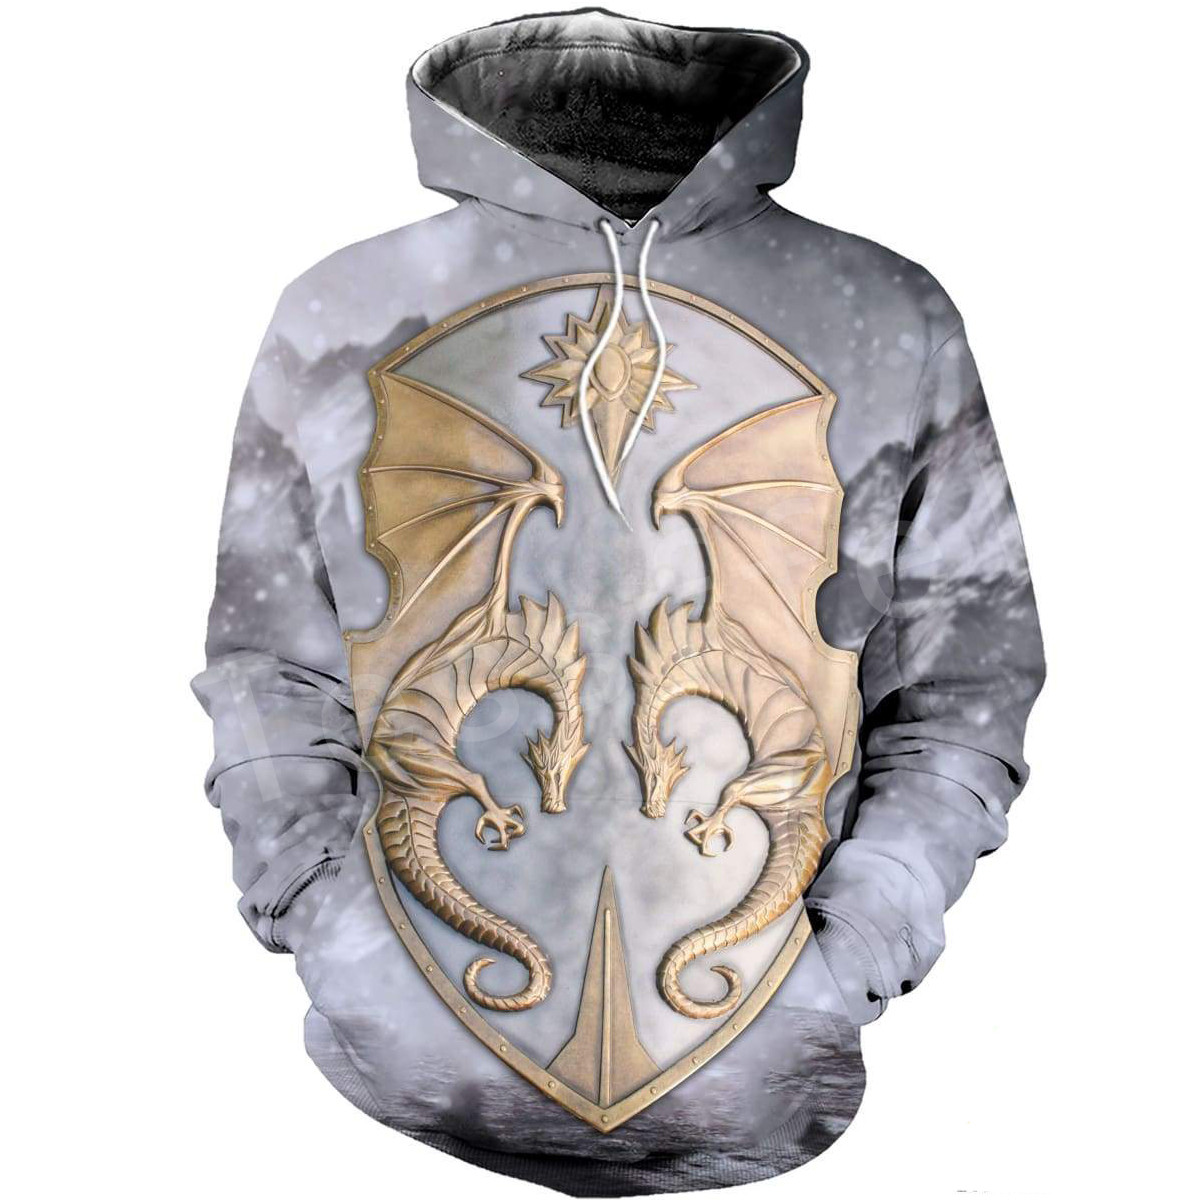 Tessffel Dragon Art Animal Harajuku MenWomen HipHop 3DPrinted Sweatshirts hoodie jackt shirts Tracksuits Casual Colorful Style 2 in Hoodies amp Sweatshirts from Men 39 s Clothing